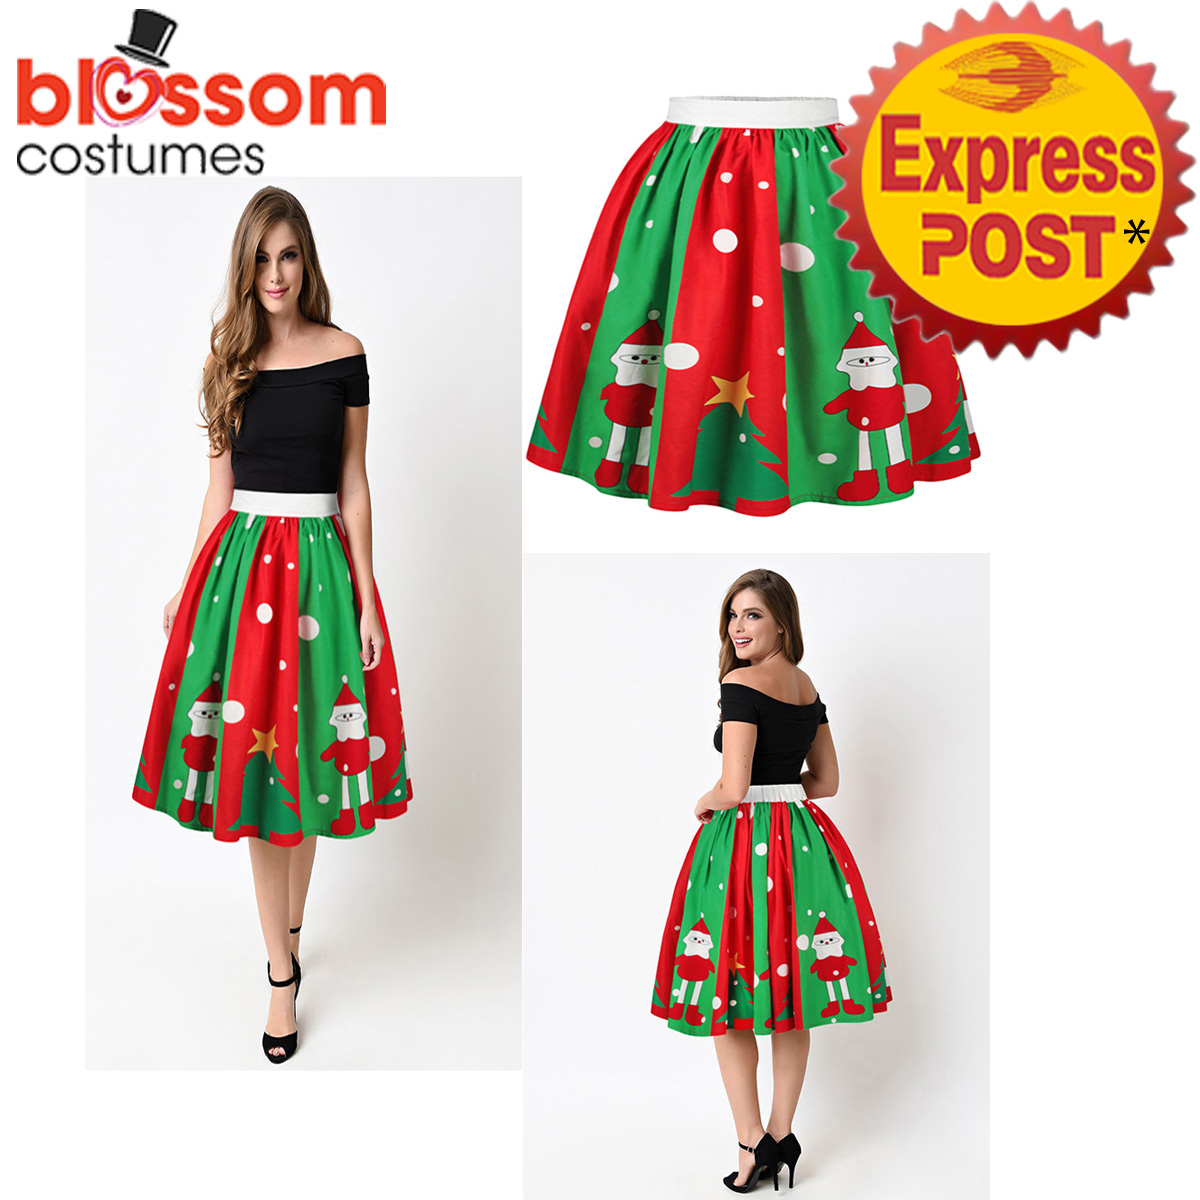 K473-Christmas-Skirt-High-Waist-Skater-Retro-Flared-Xmas-Rockabilly-Vintage-50s